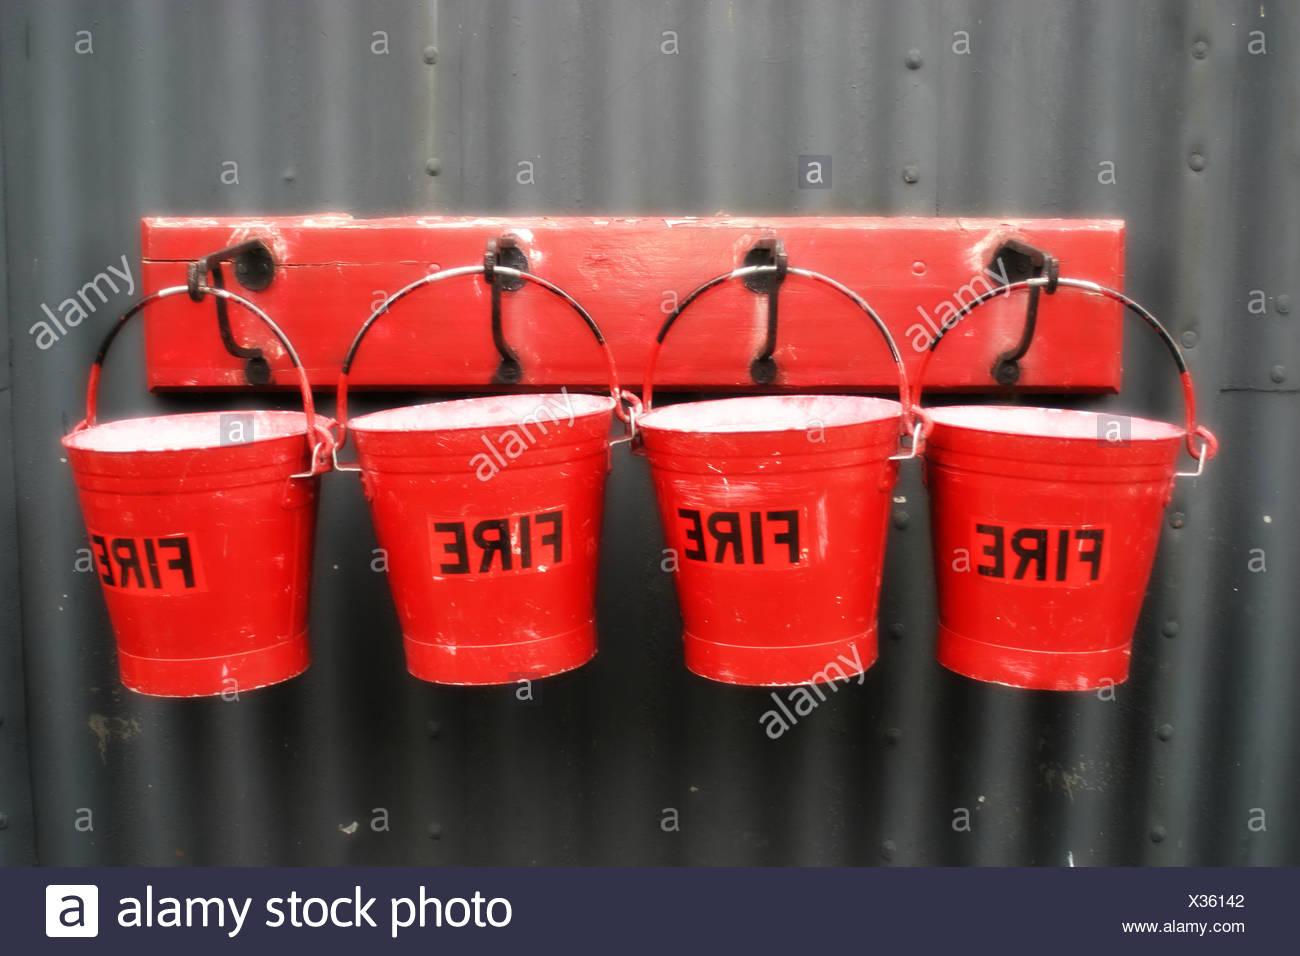 fire buckets - Stock Image